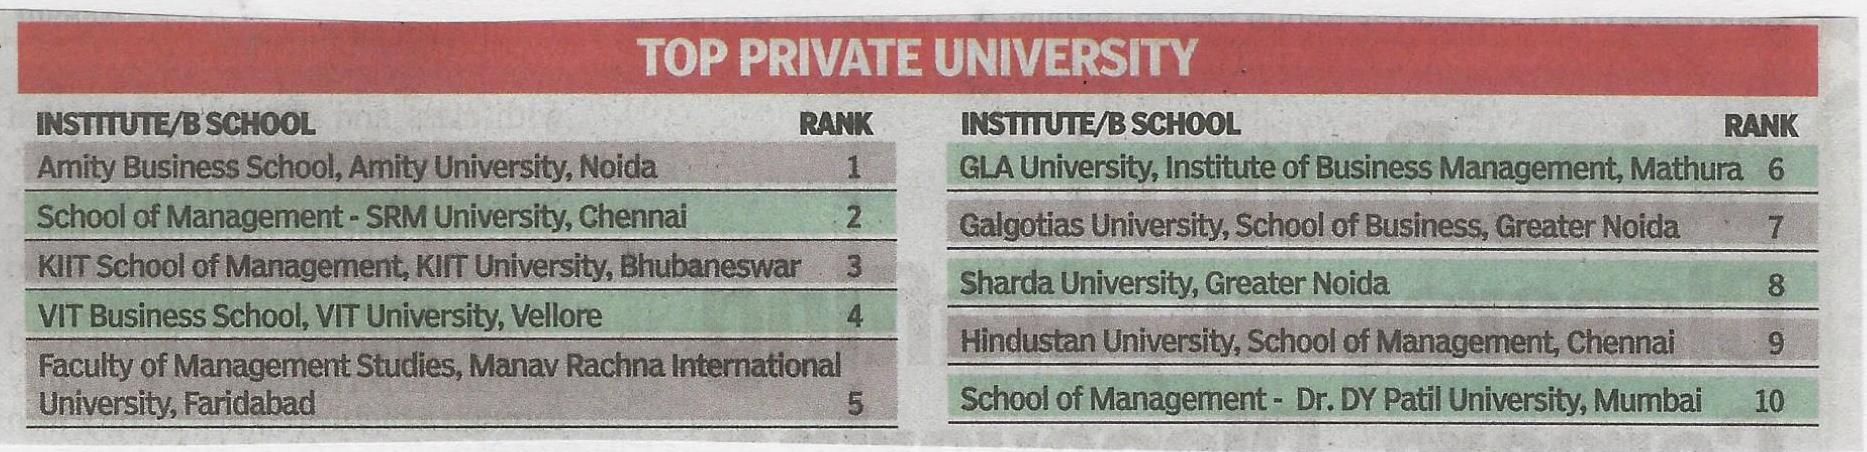 Top Private University- Amity Business School, Amity University, Noida ranked No 1 - Amity Events